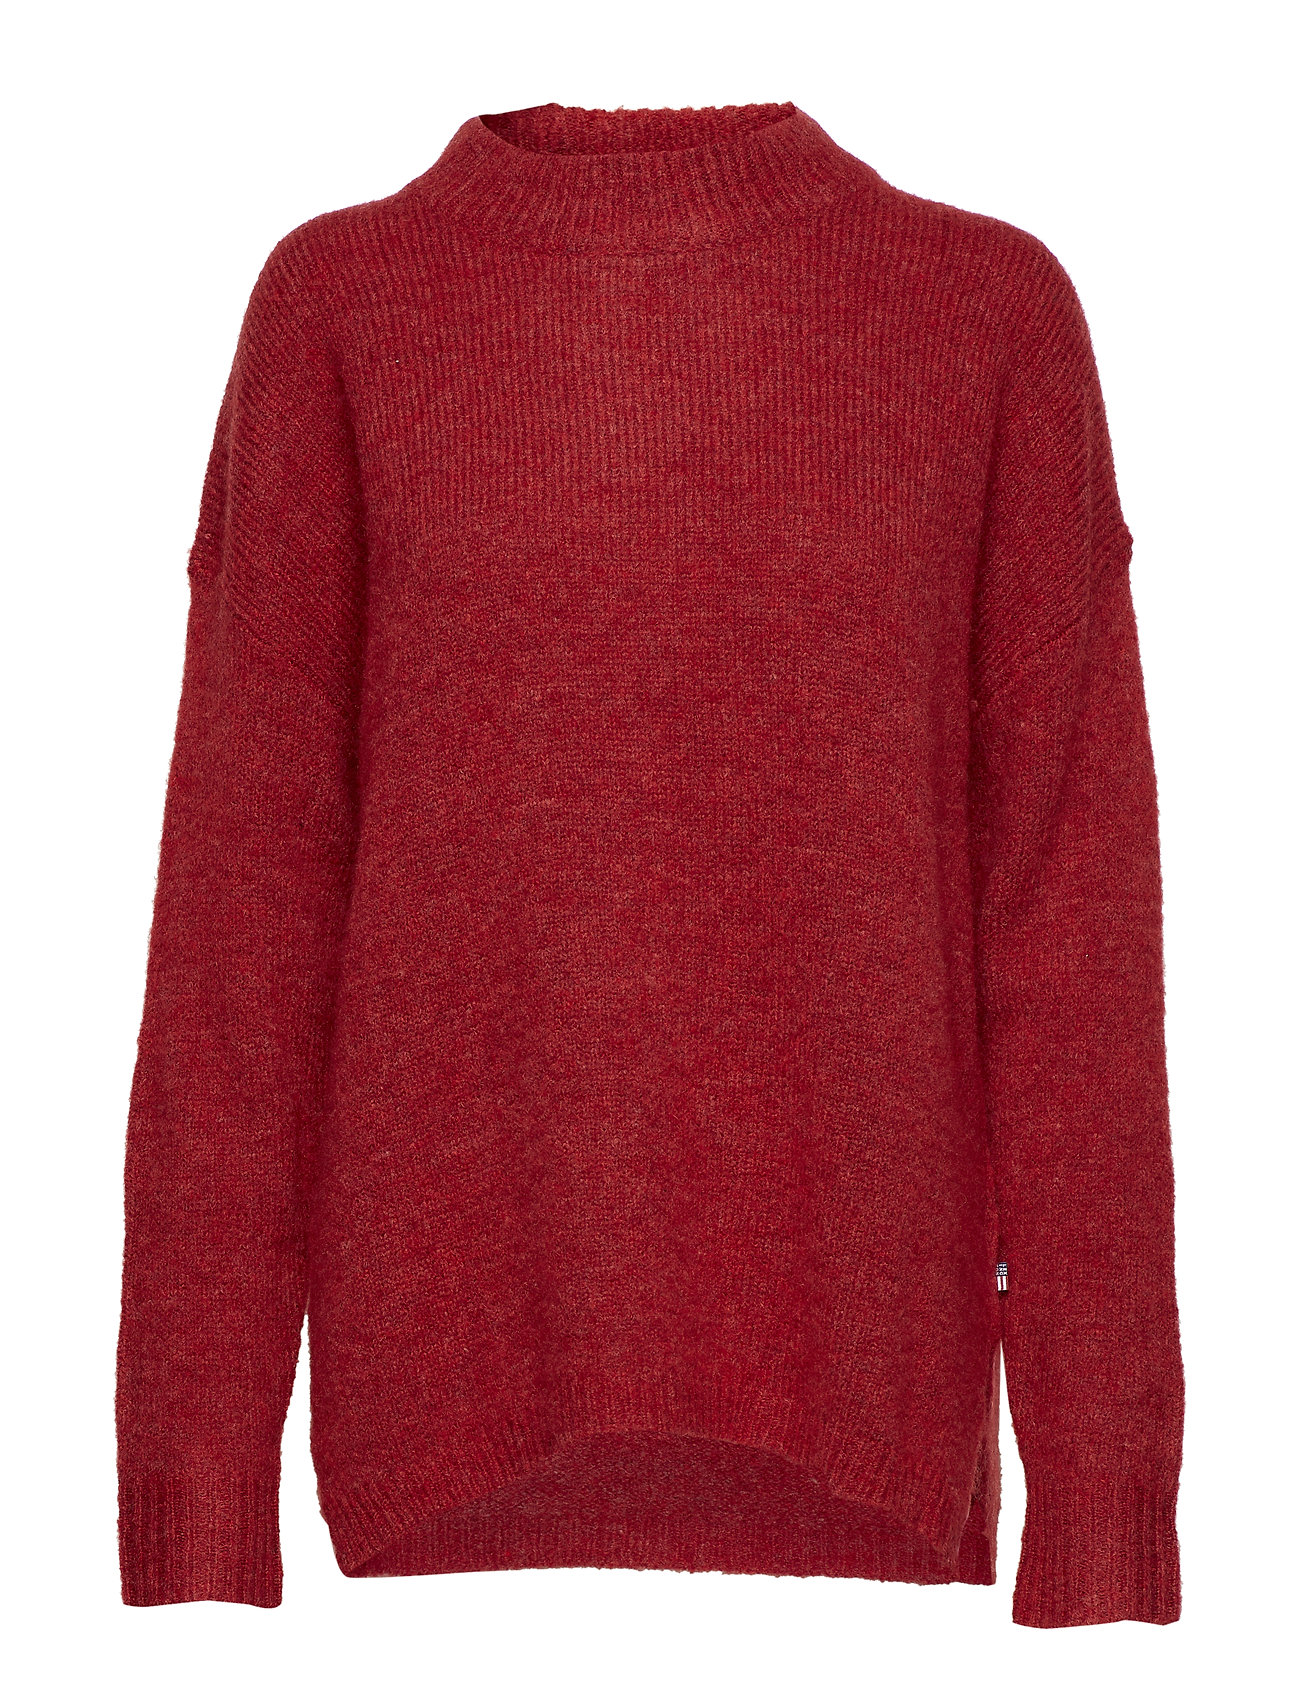 Lexington Clothing Talula Sweater - ROSEWOOD RED